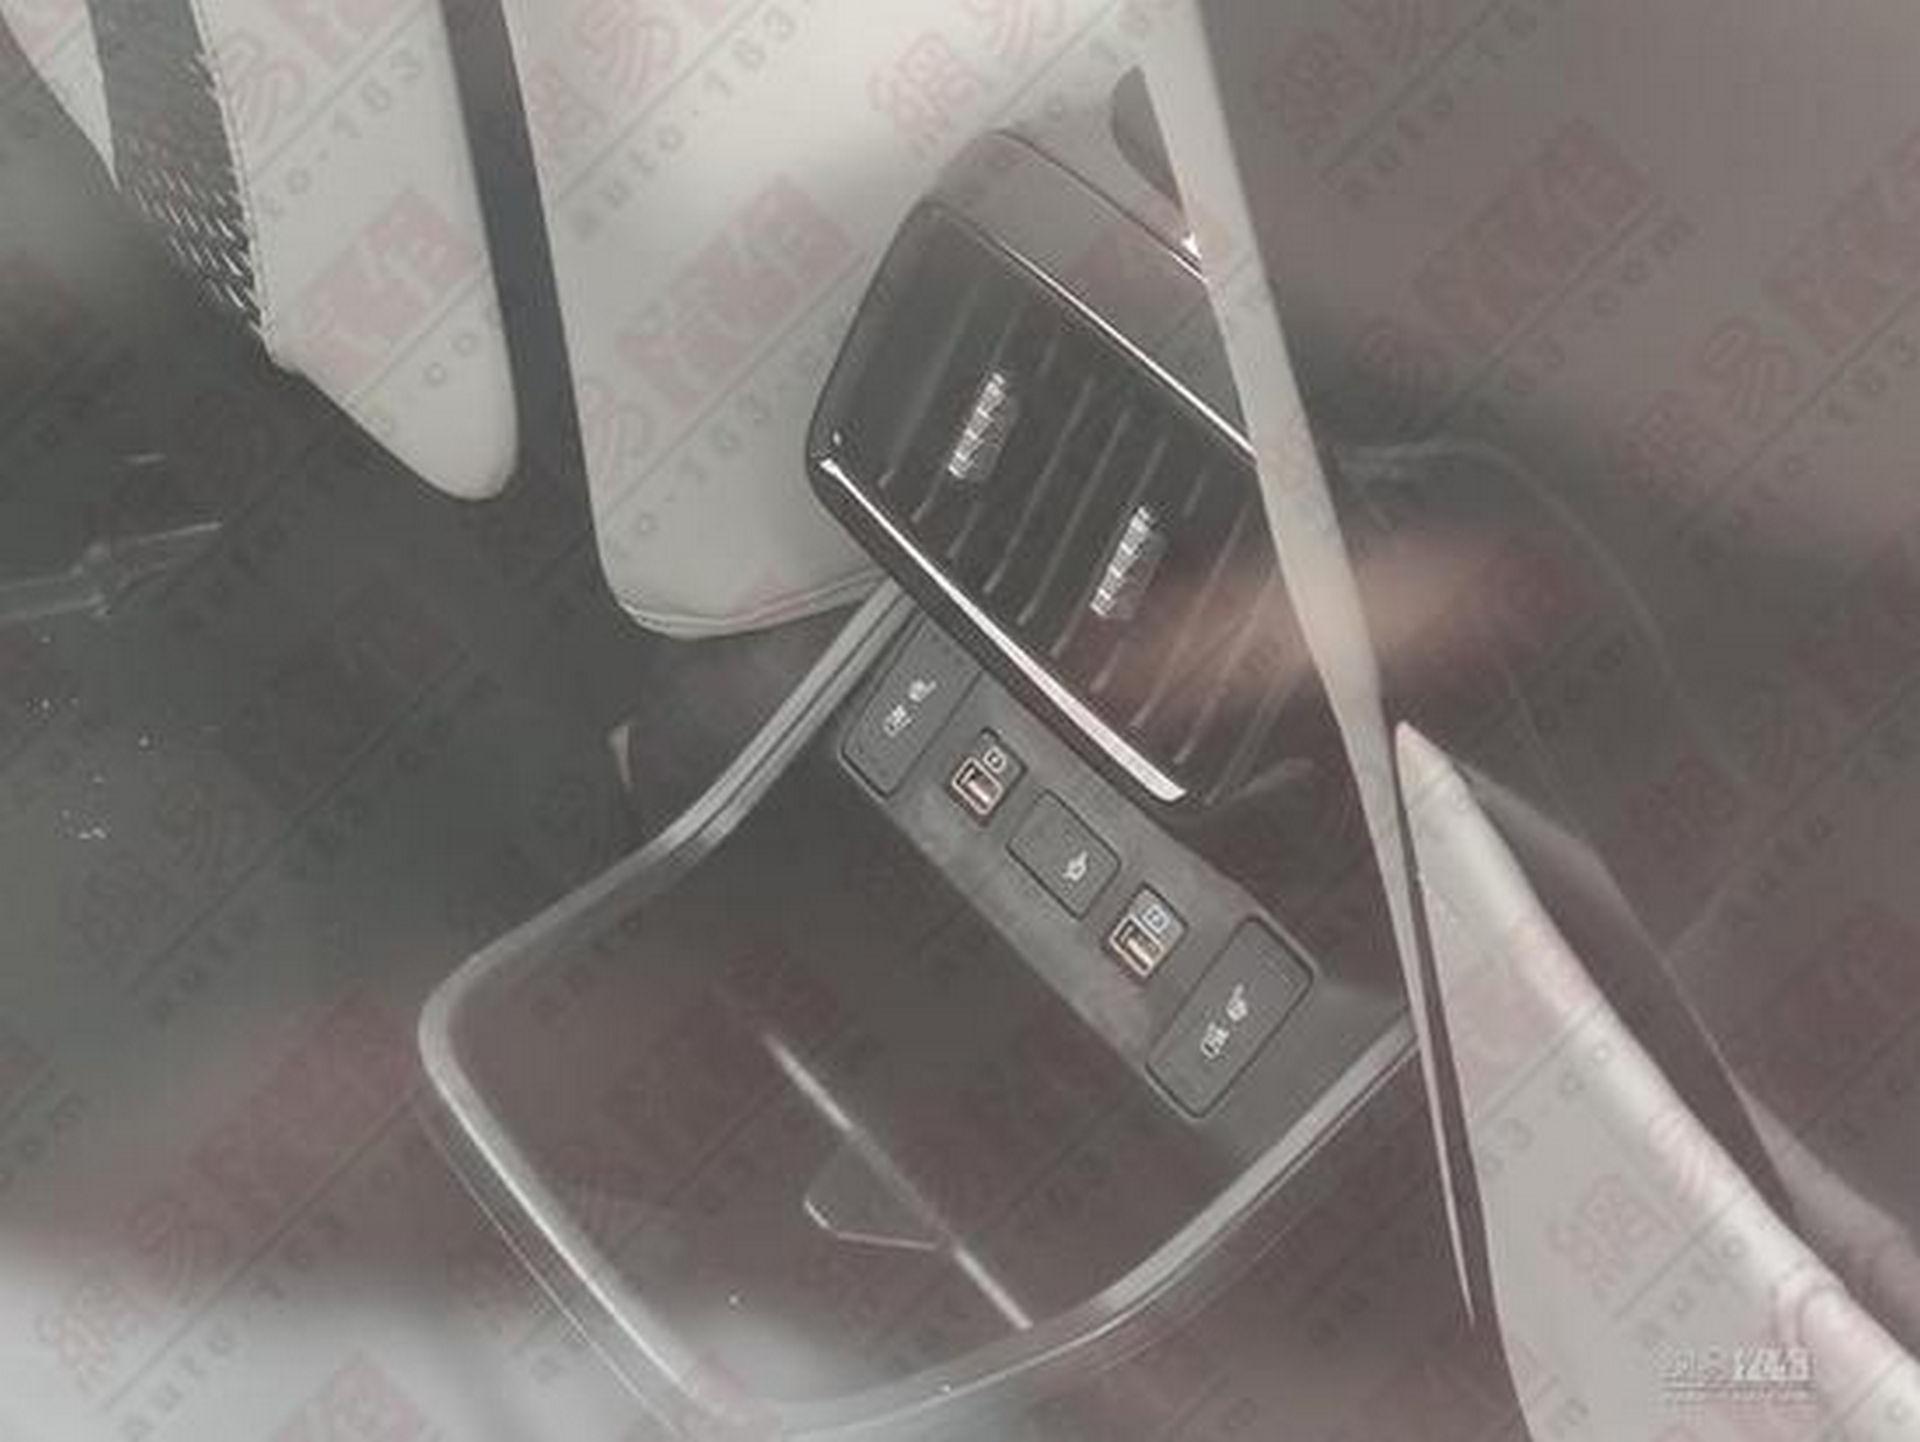 Hyundai_Custo_leaked_0013